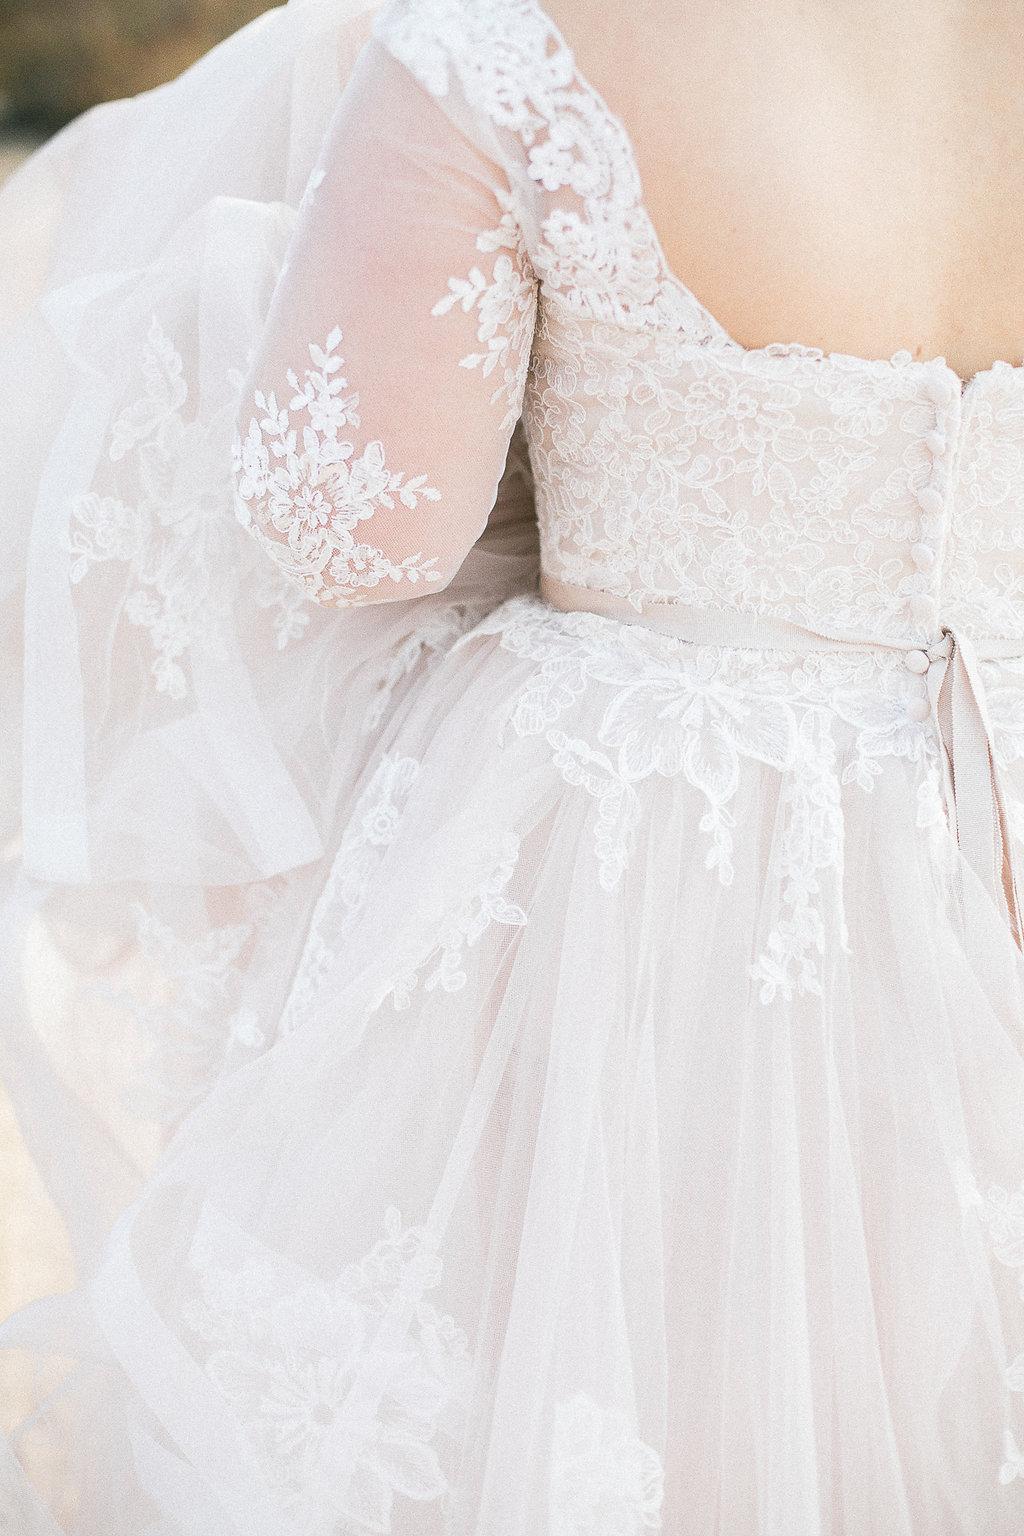 dress details.jpg